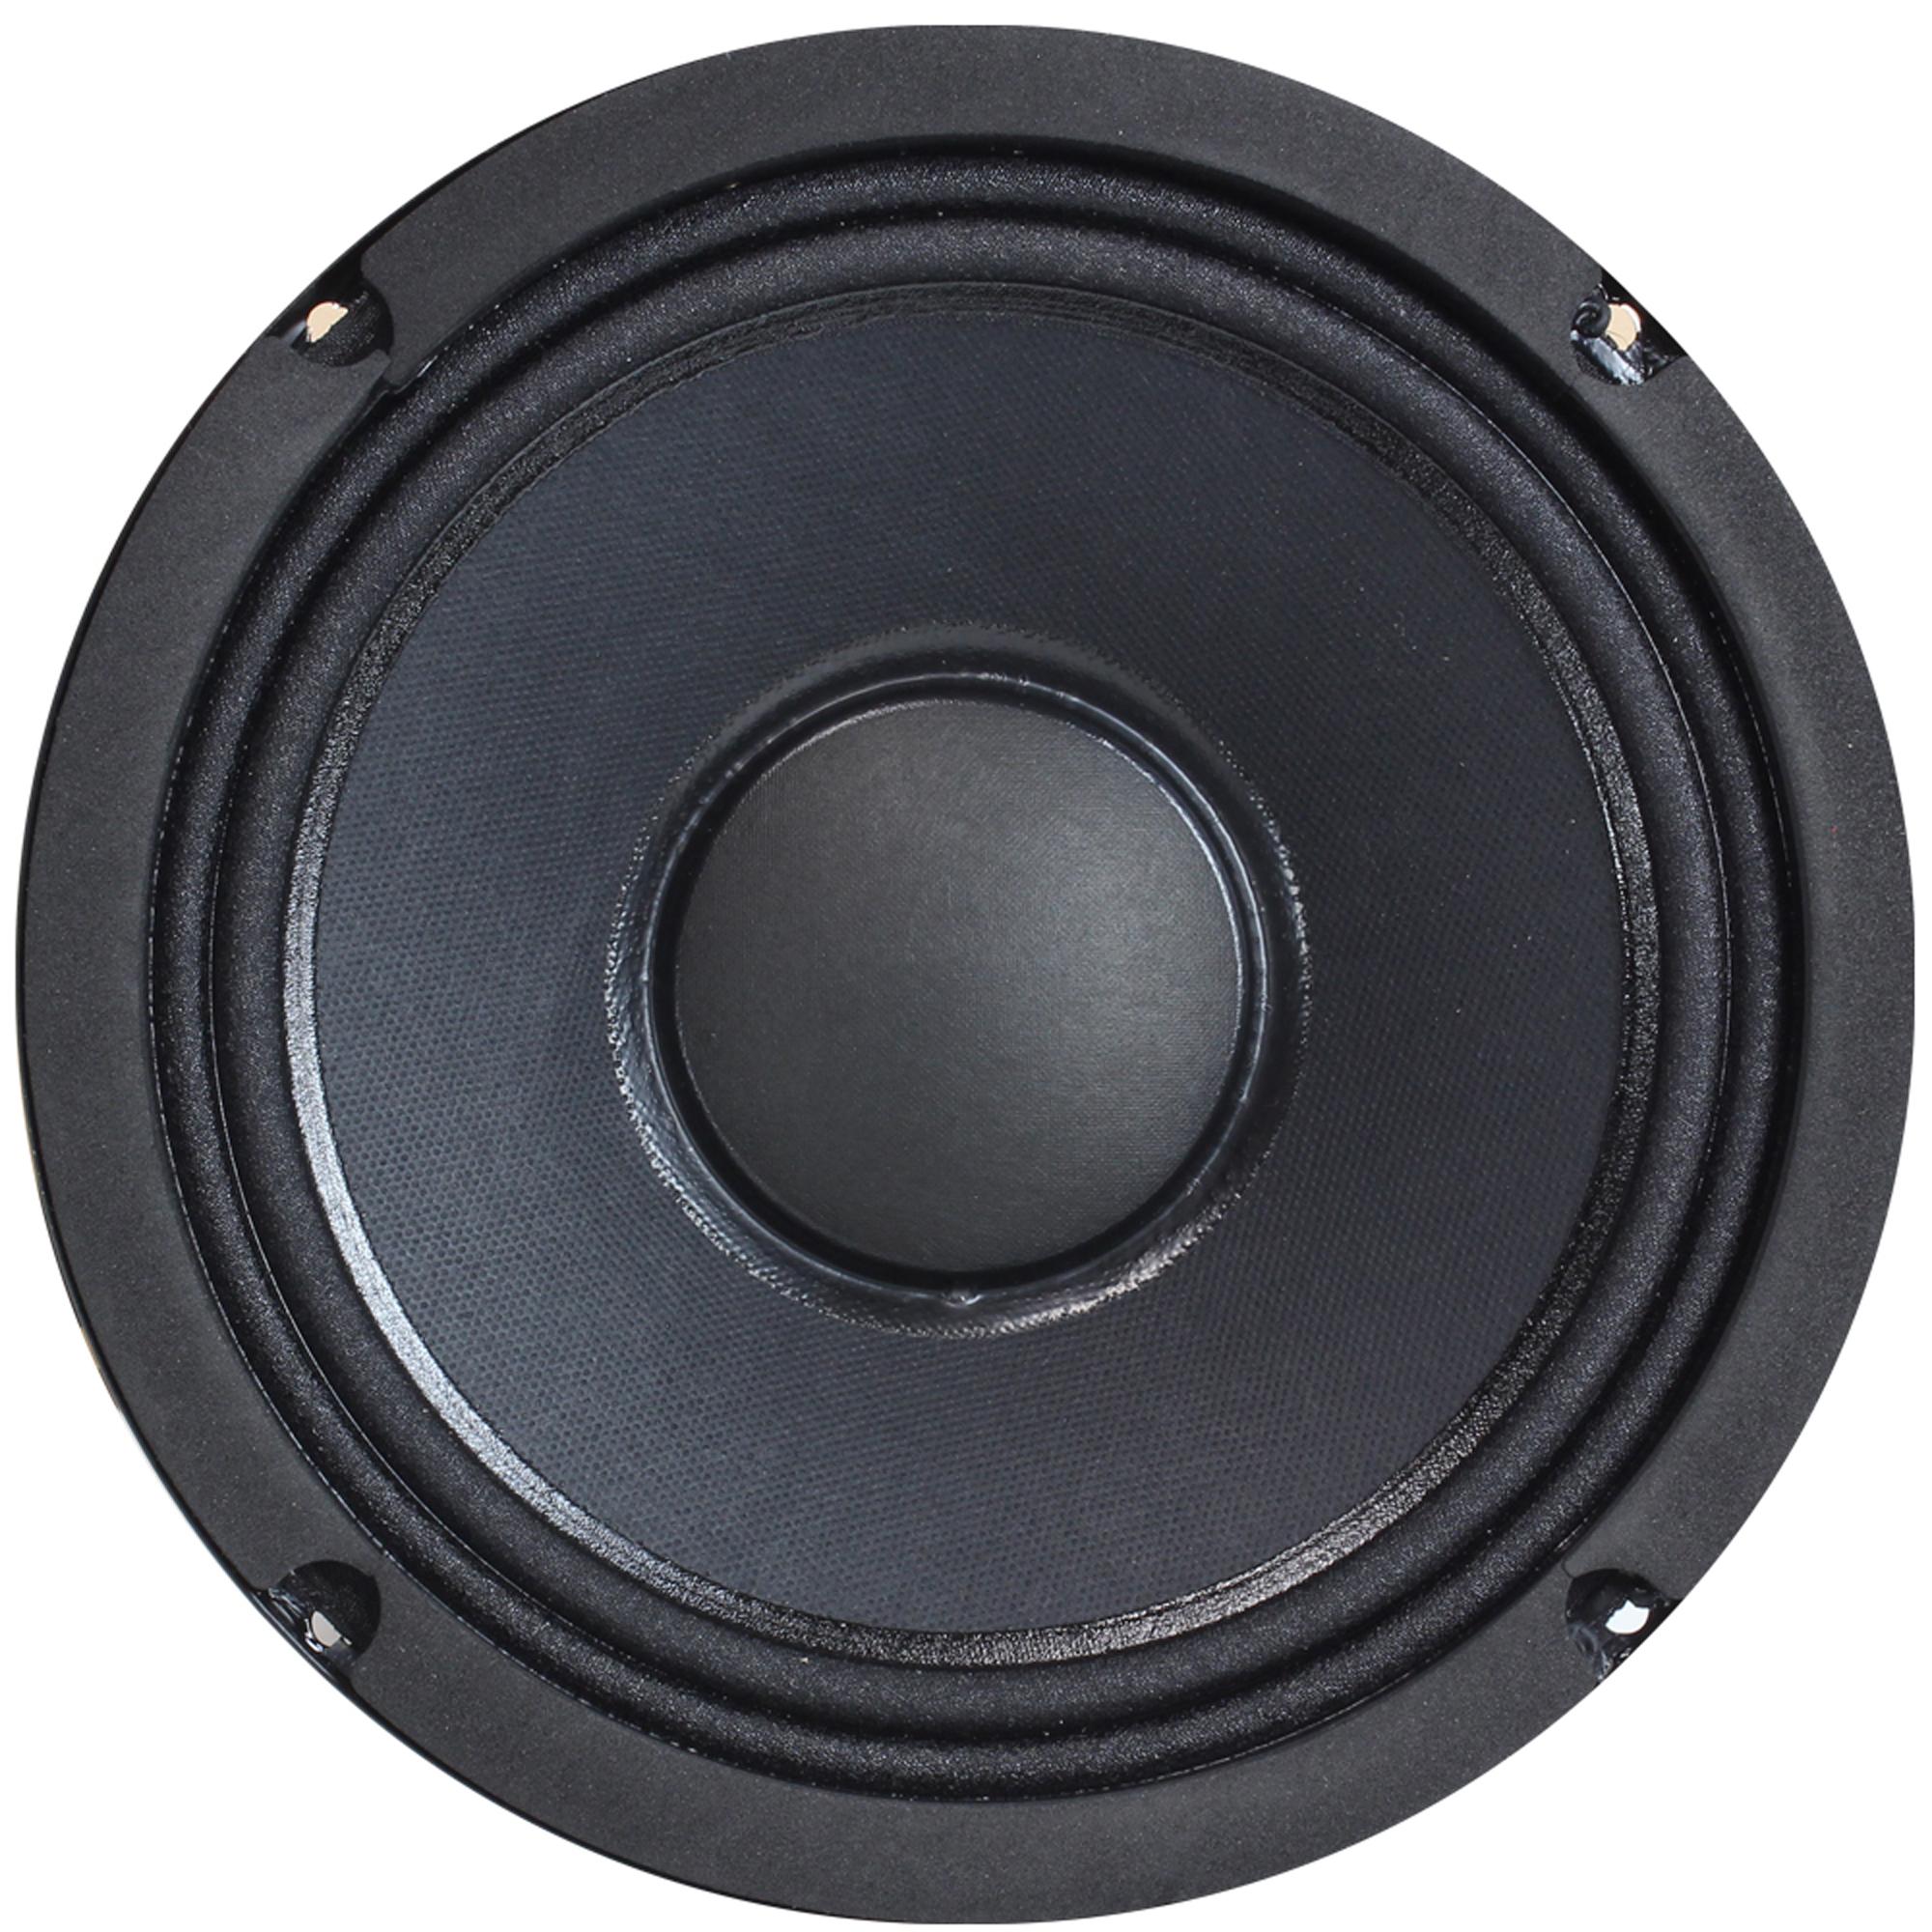 "Stage Line SP8/150PA 8"" Midrange Speaker Driver 300W"